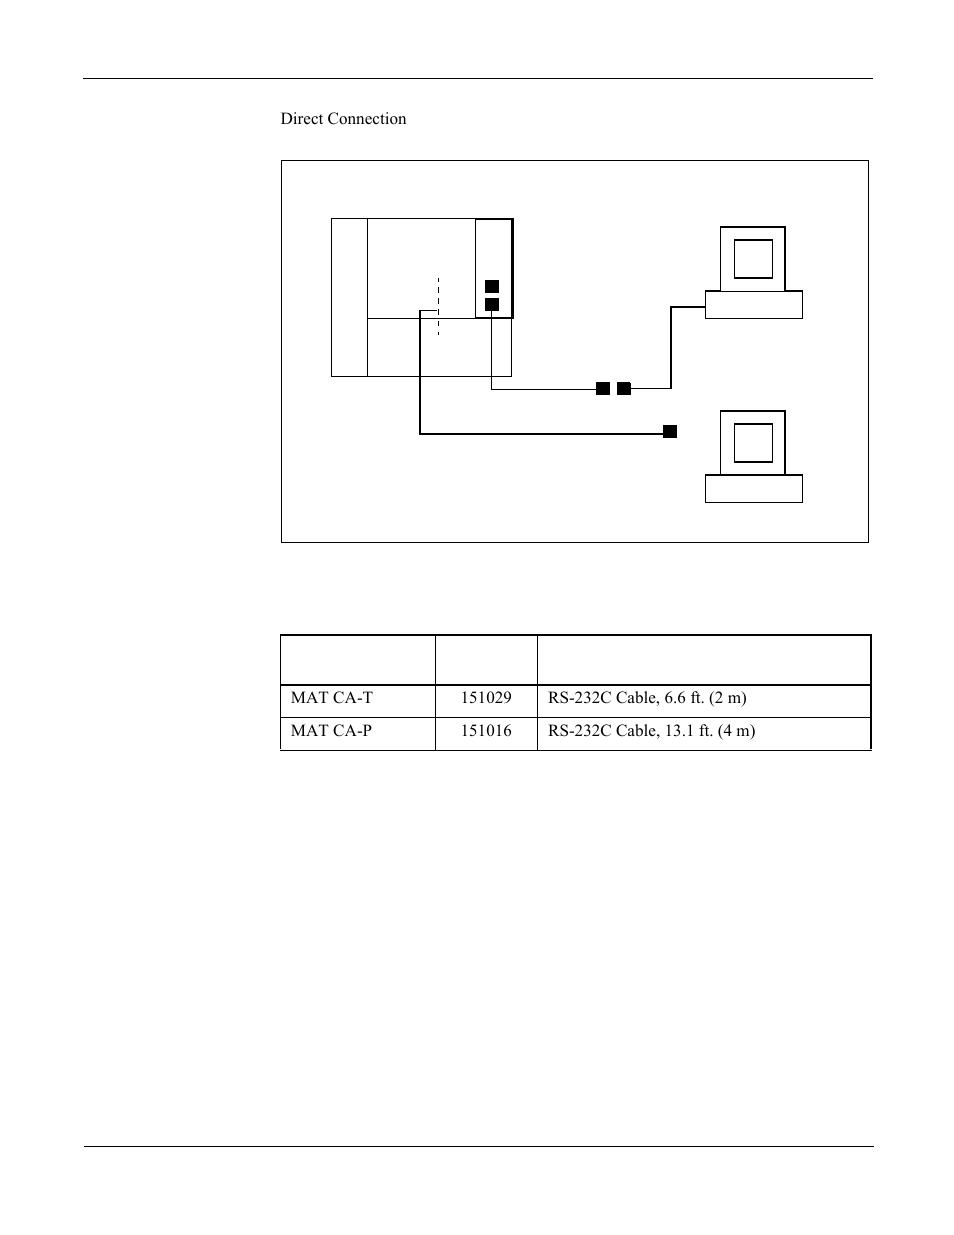 figure 6 8 mat cable connection direct table 6 8 nec neax 2000 rh manualsdir com NEAX 2400 NEC 2014